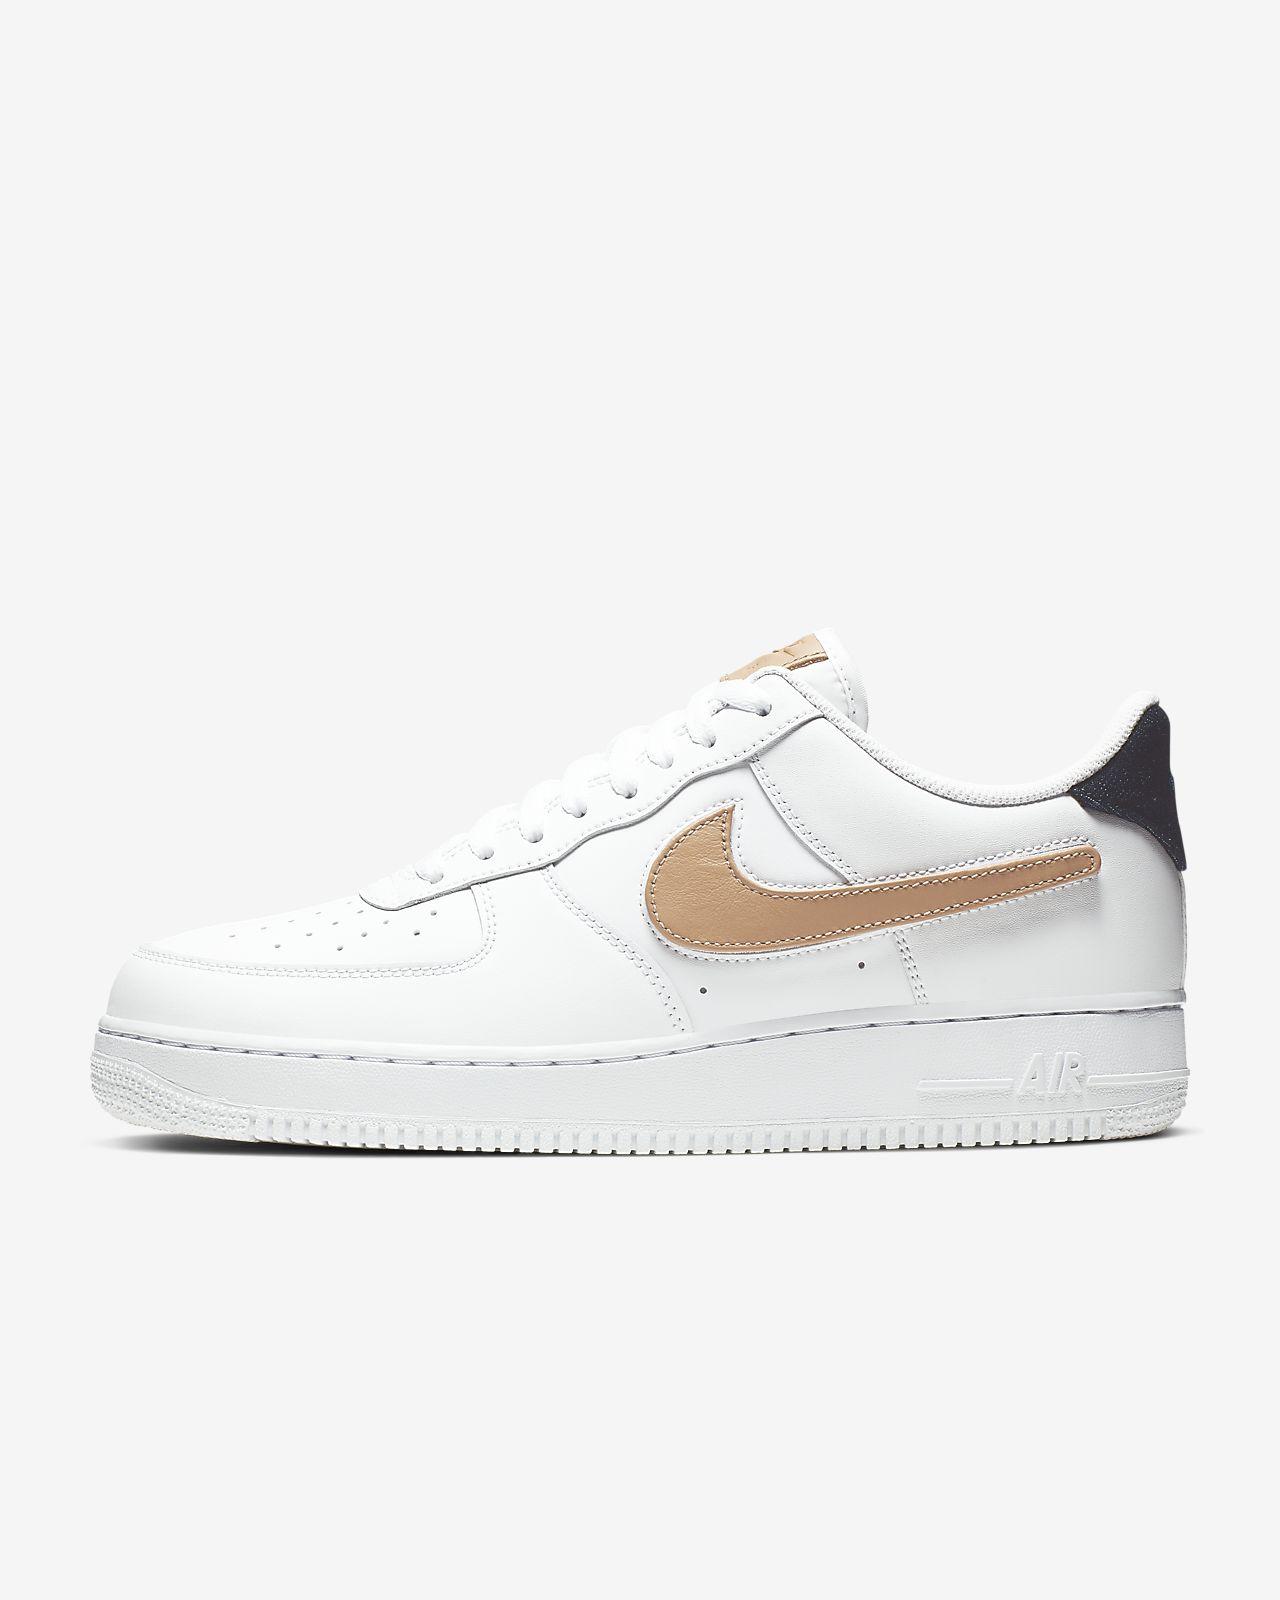 Buty Casual Damskie Promocja Nike Air Force 1 '07 Low